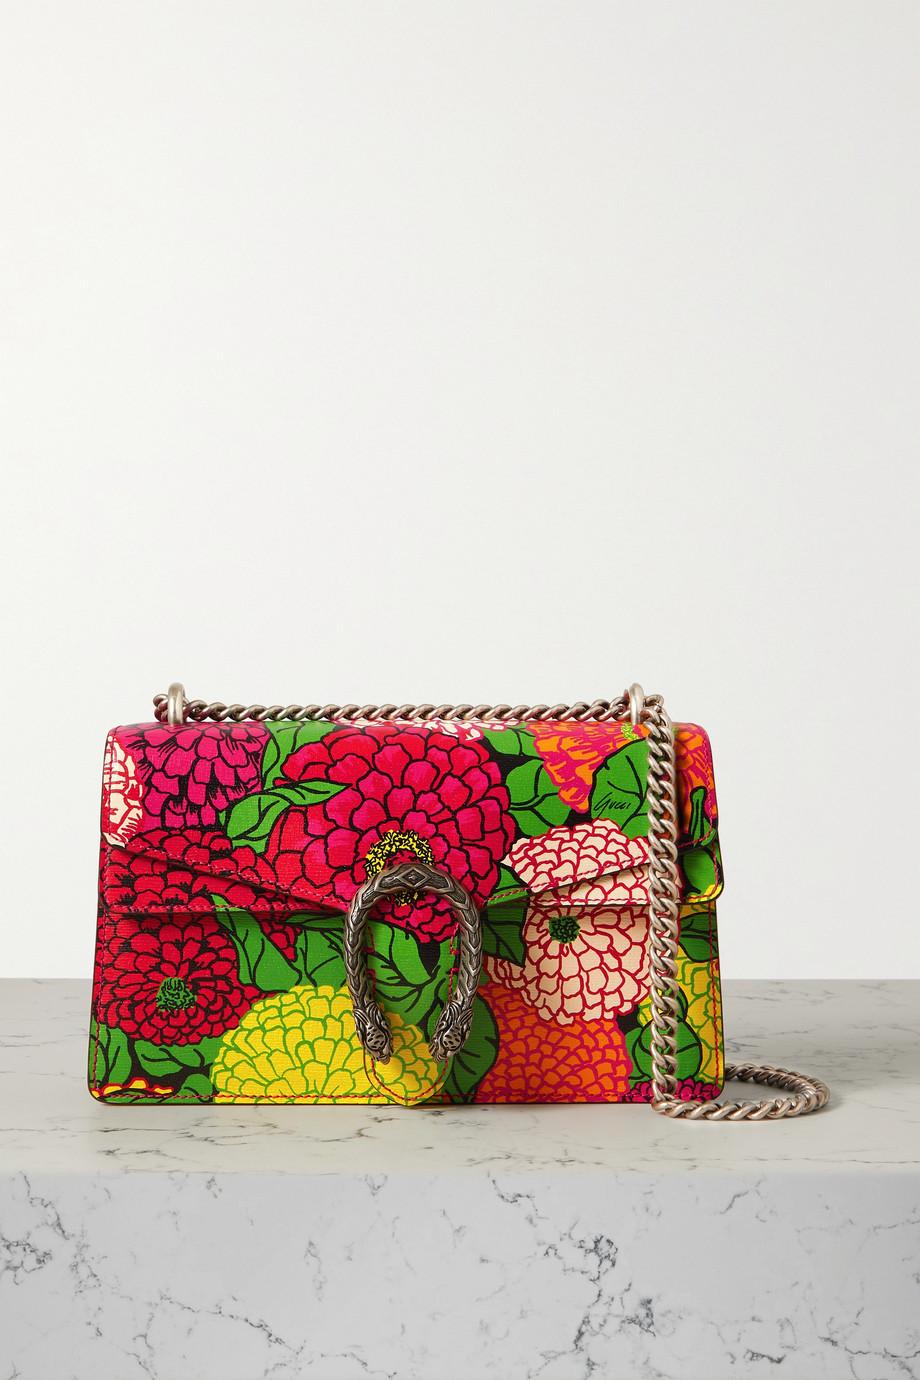 Gucci + Ken Scott Dionysus small floral-print leather shoulder bag